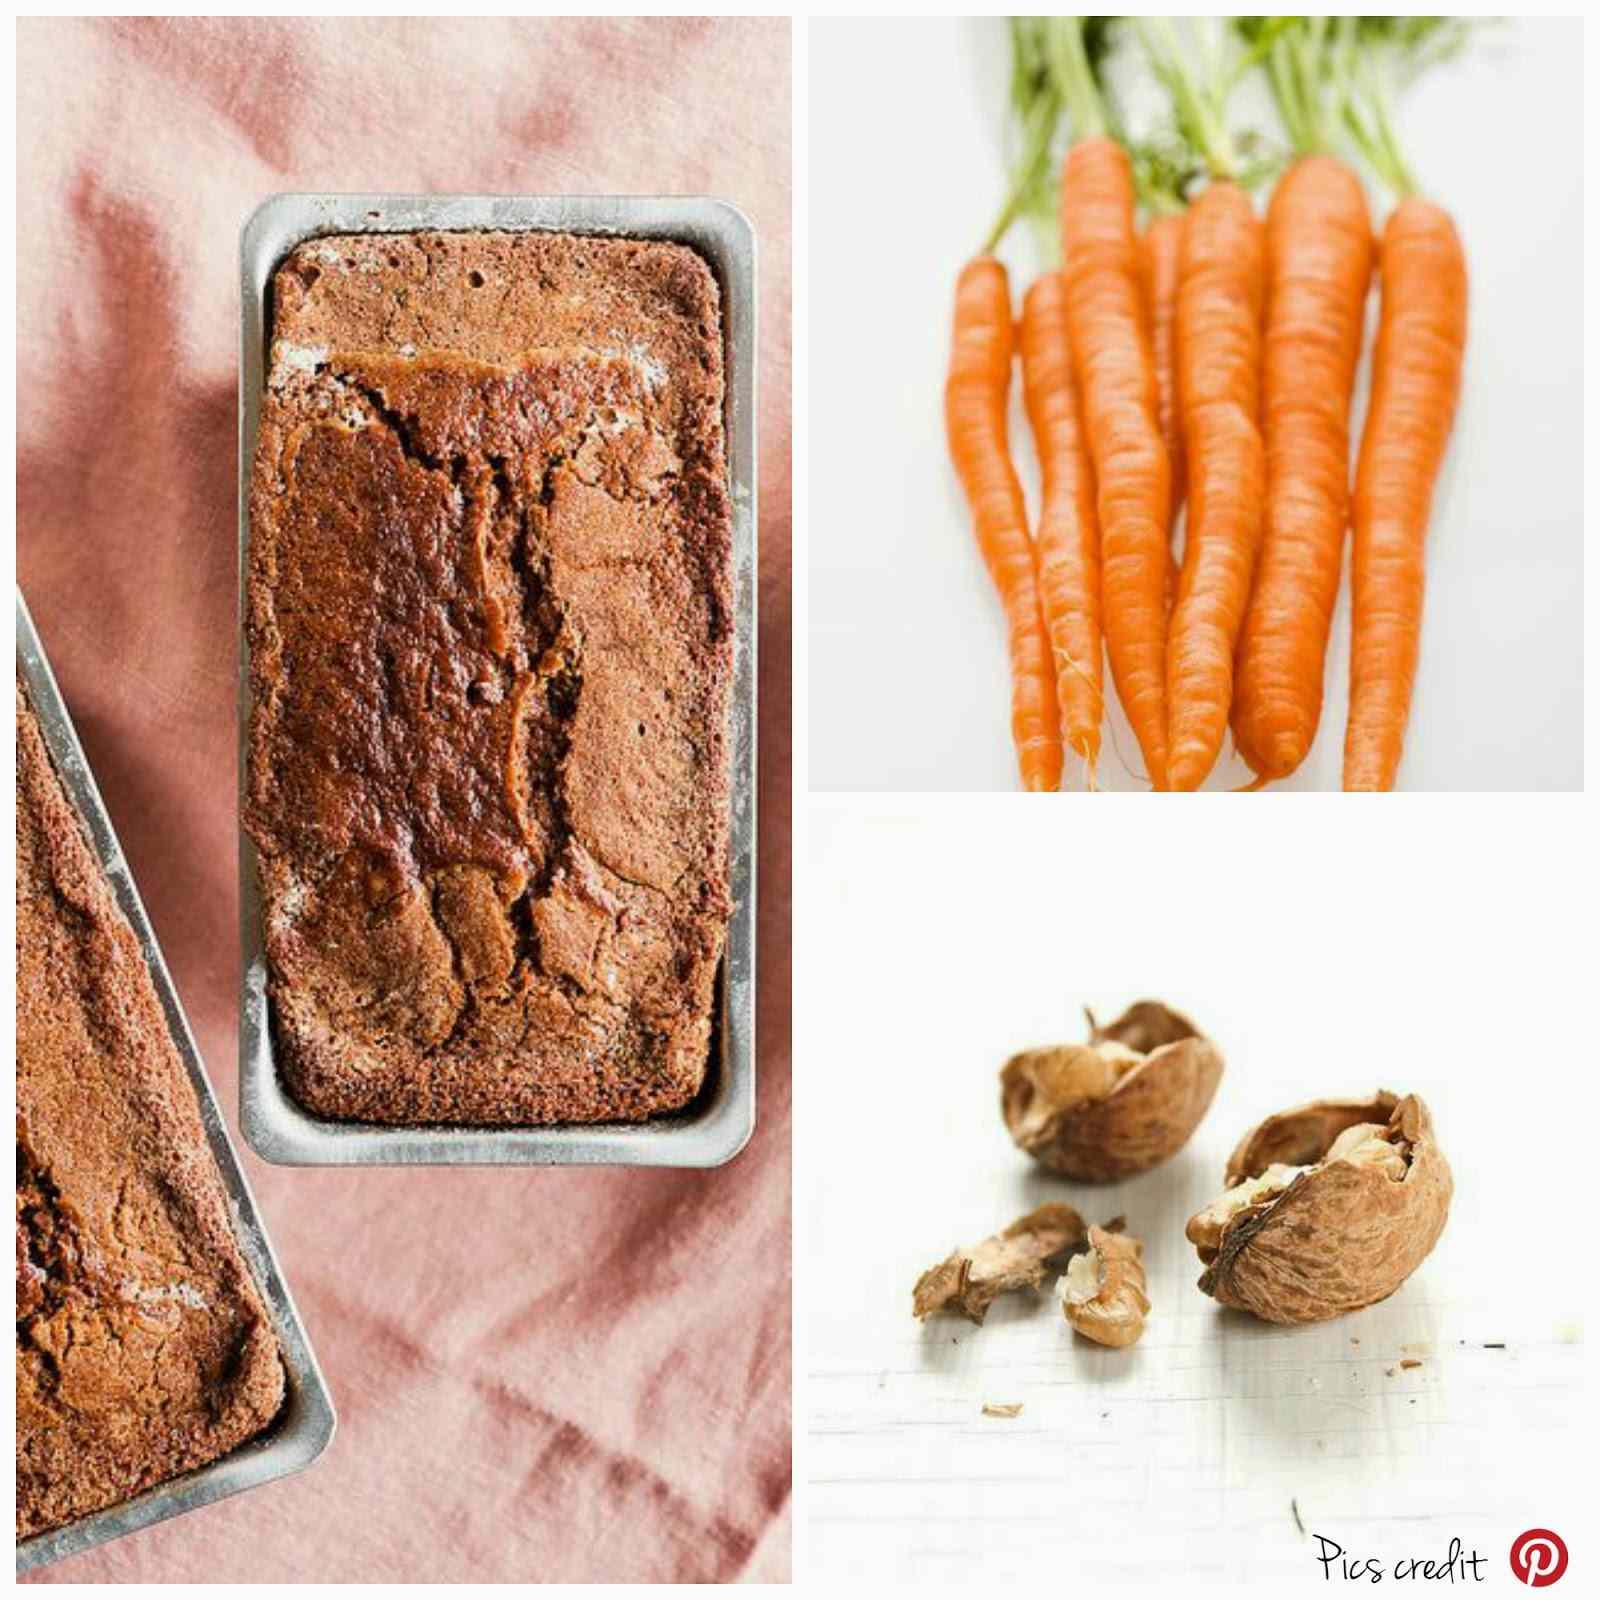 Ricetta: Torta morbida carote e noci / soft carrot and nuts cake recipe